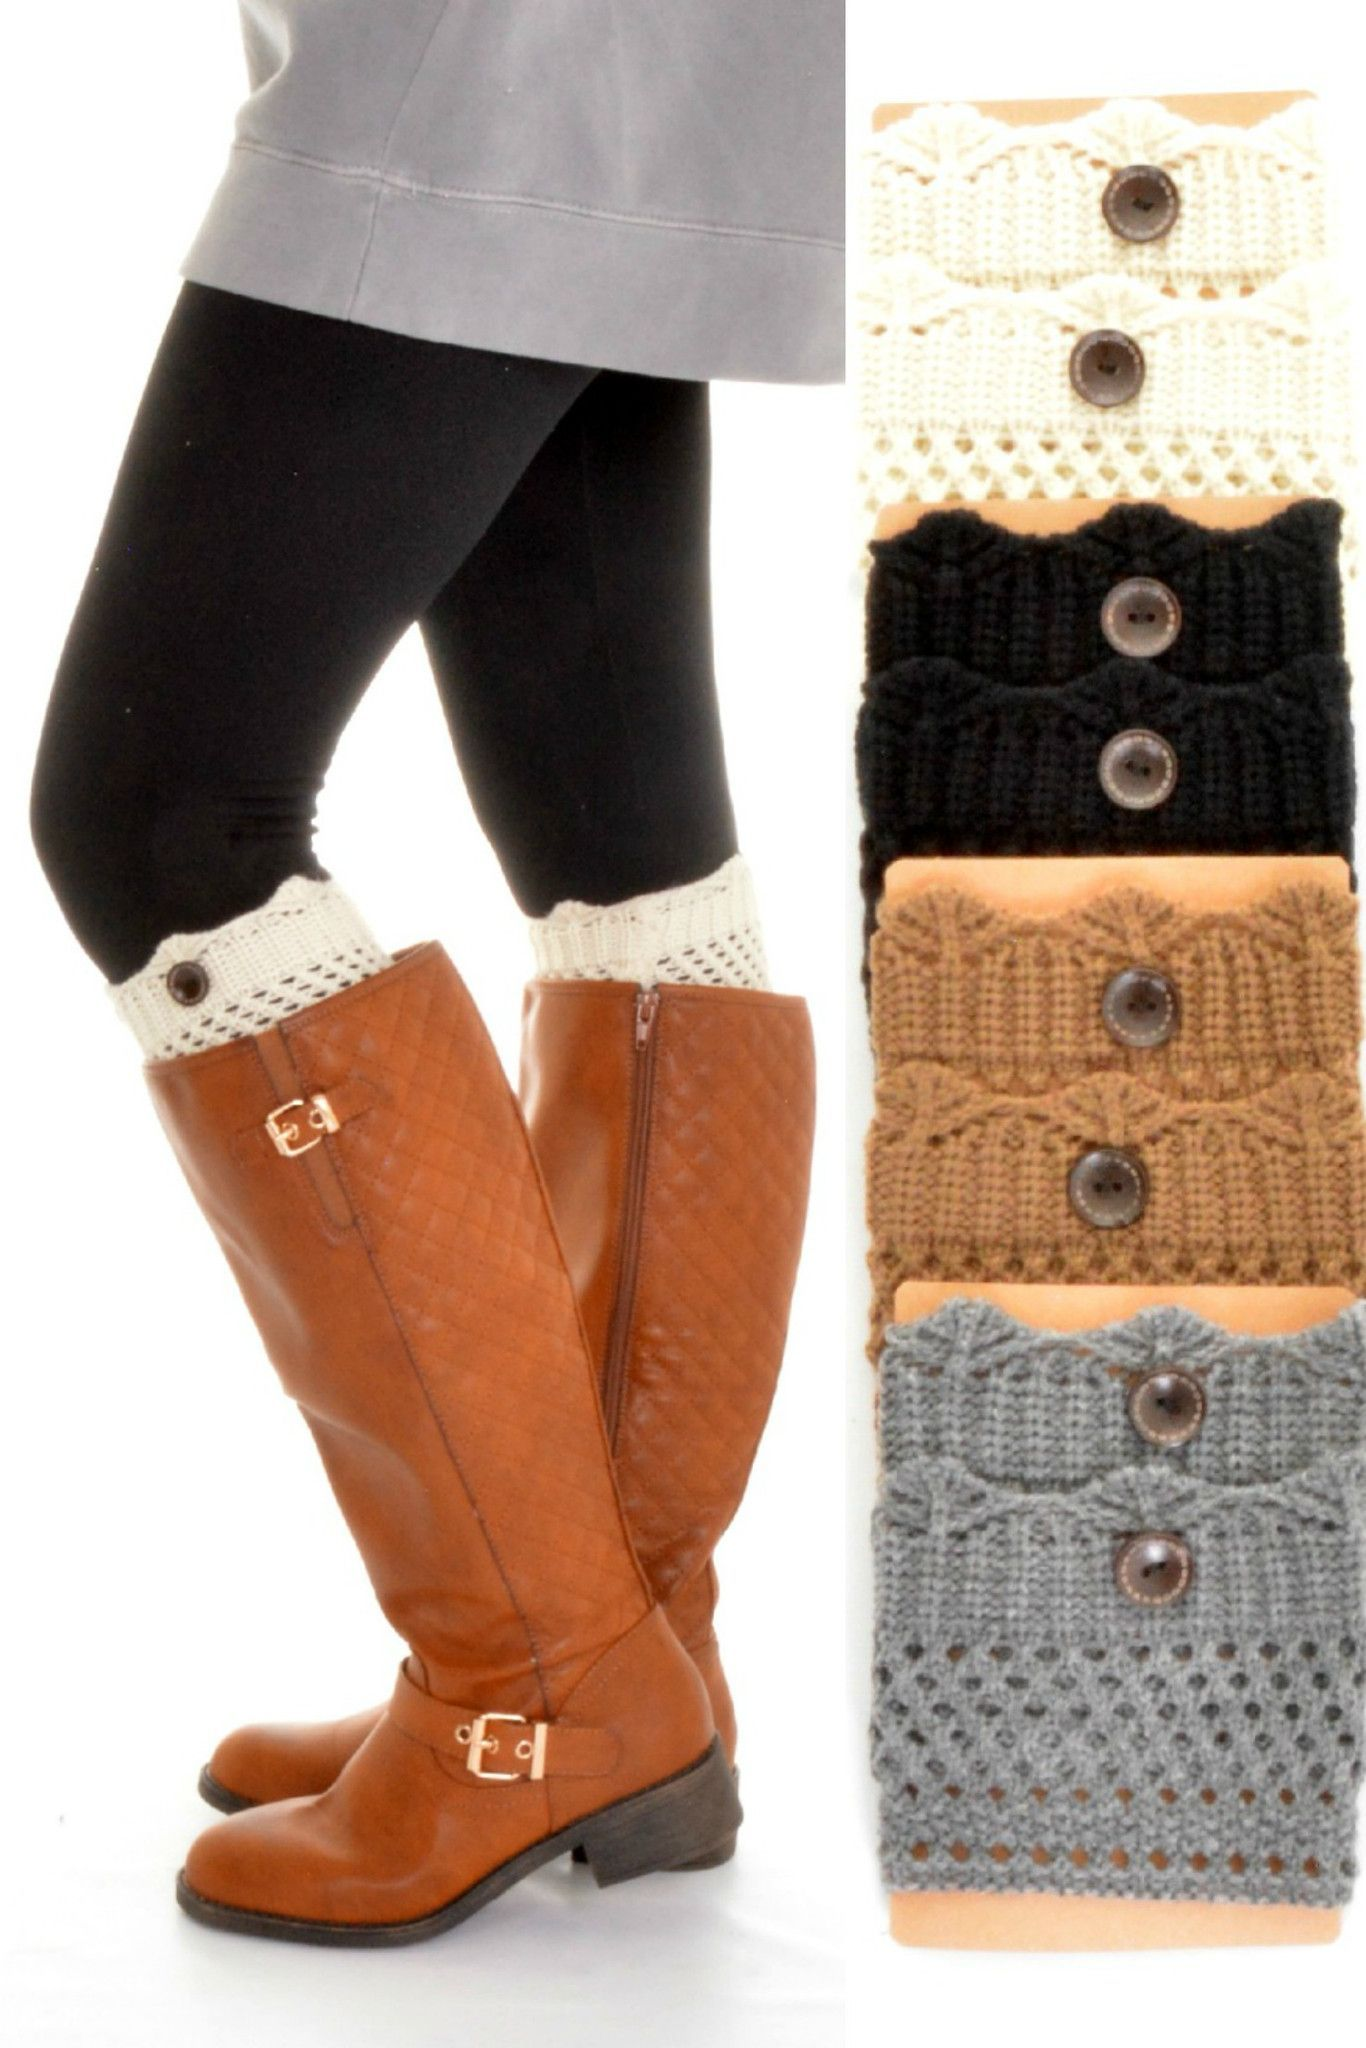 LaRue Crochet Boot Cuff | Foot fetish | Pinterest | Botas, Tejido y Lana